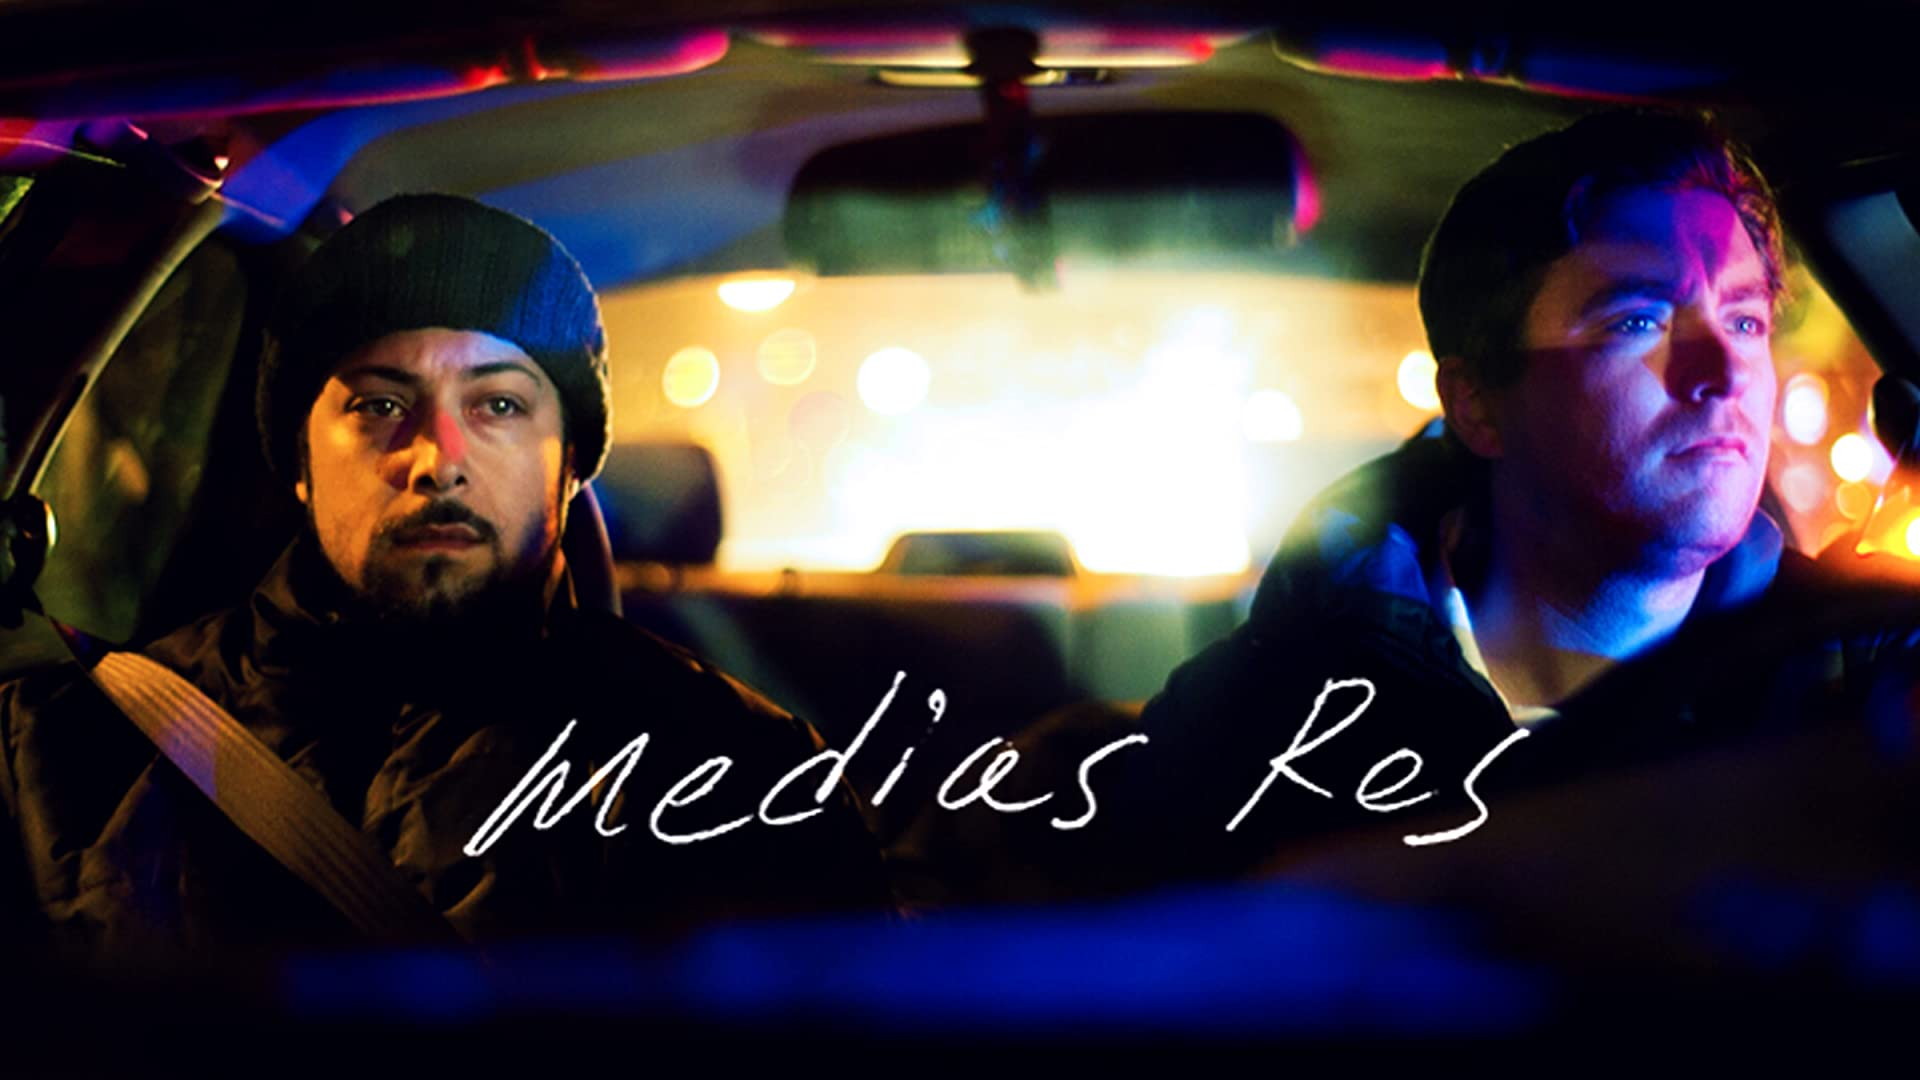 Medias Res